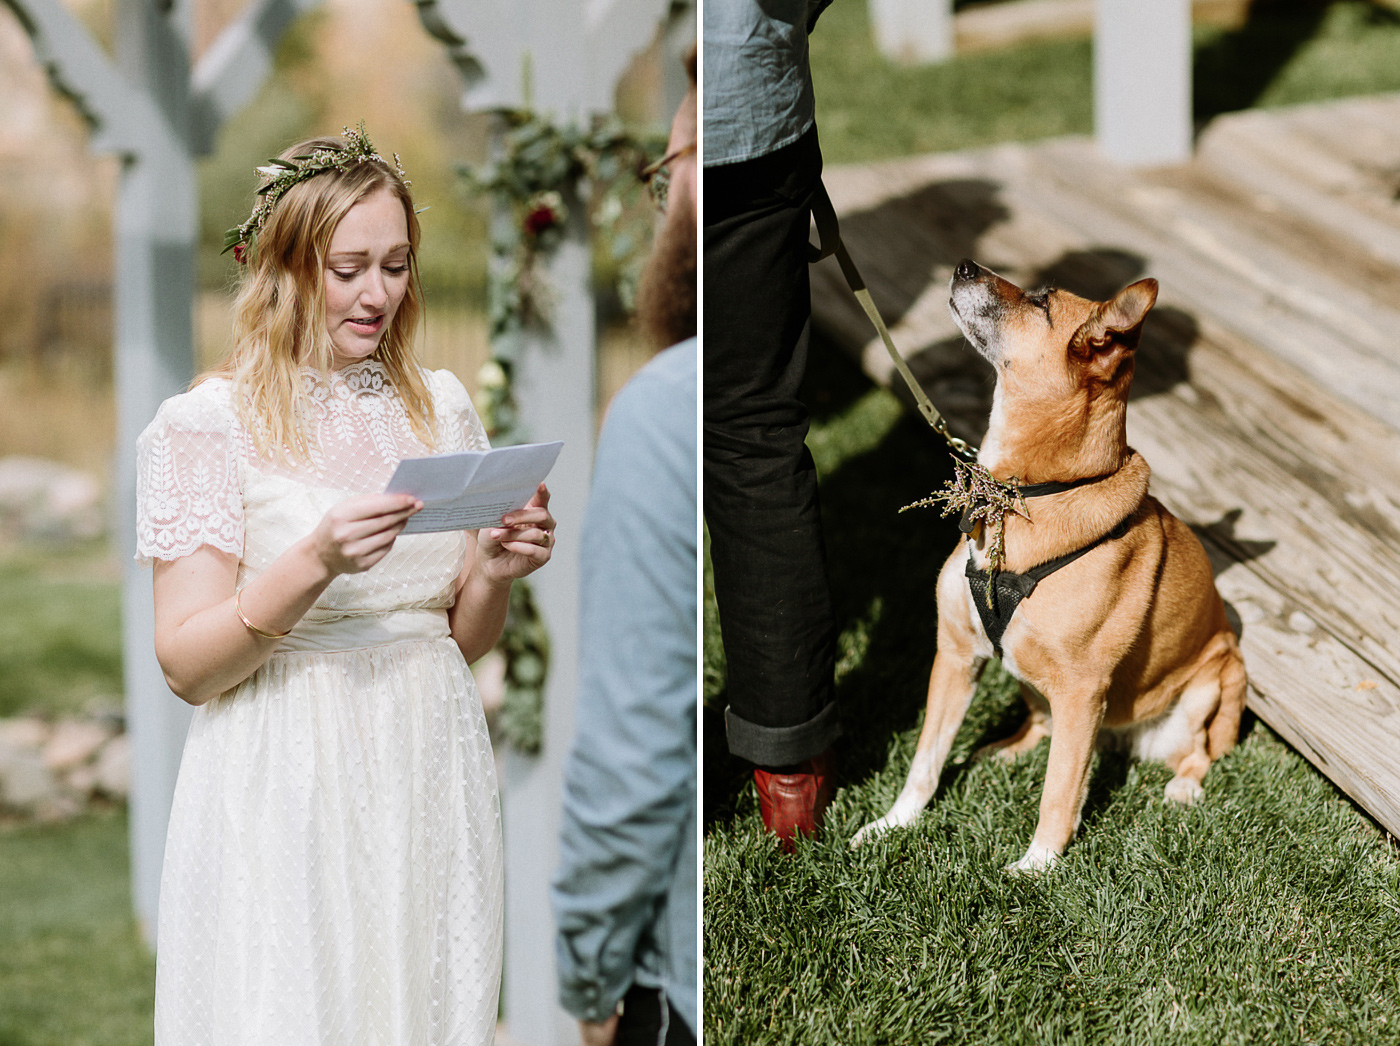 Dog watching bride during wedding ceremony vows